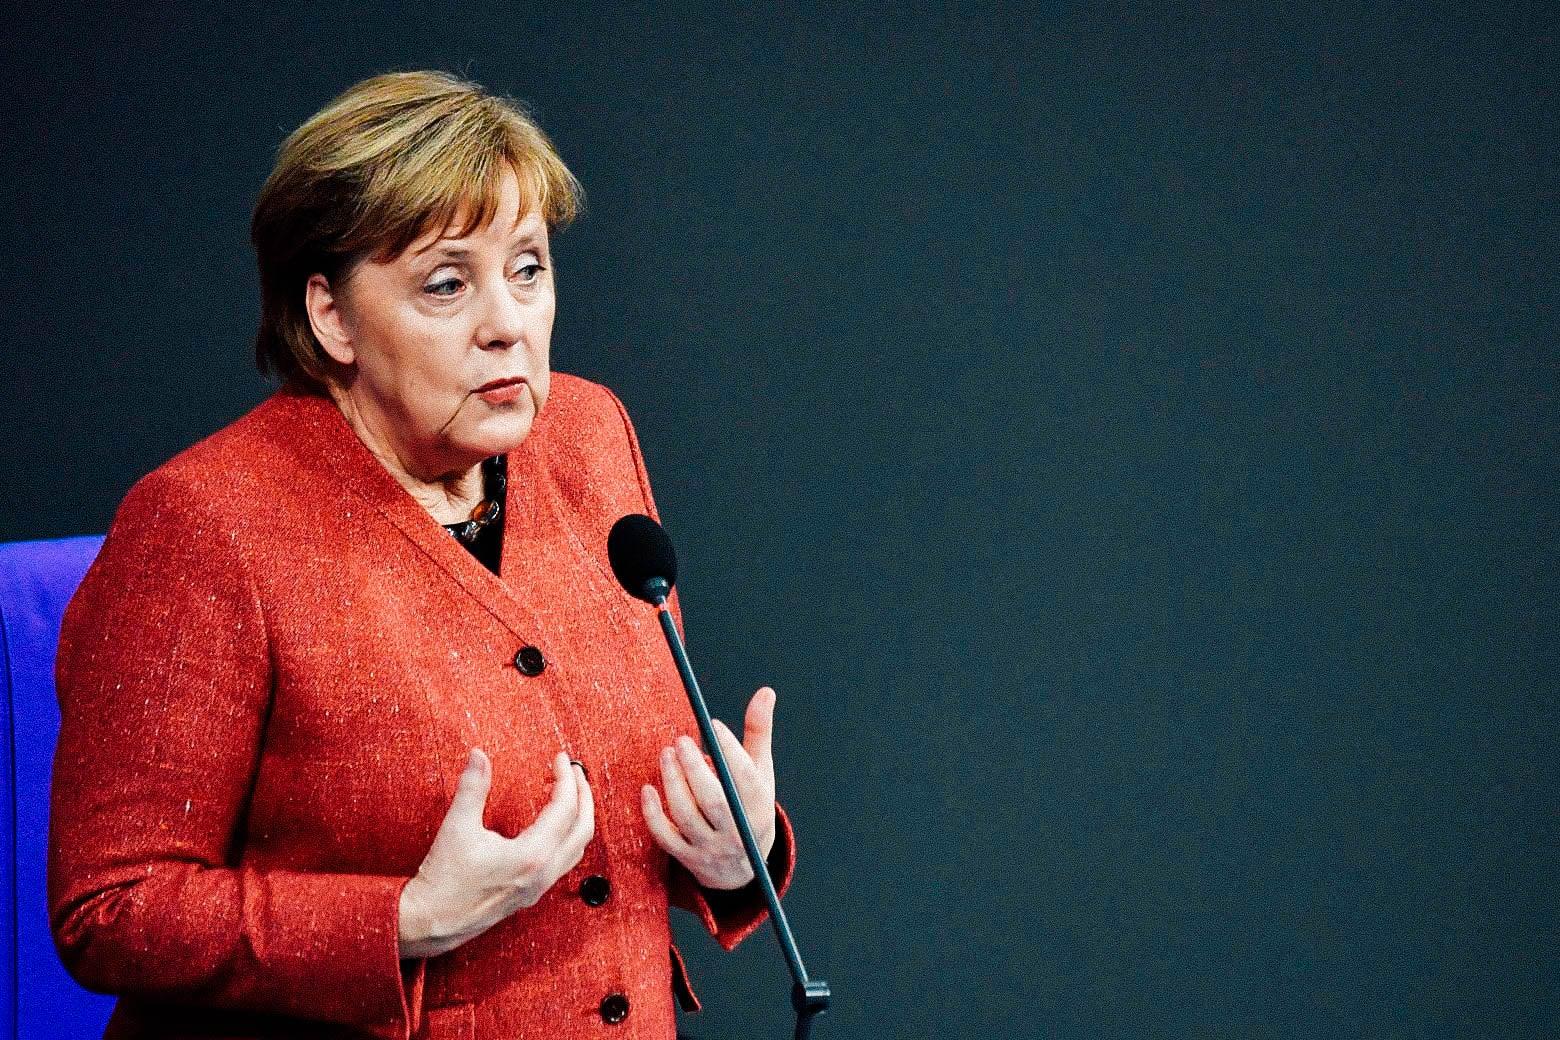 German Chancellor Angela Merkel answers questions on Dec. 12 in Berlin.